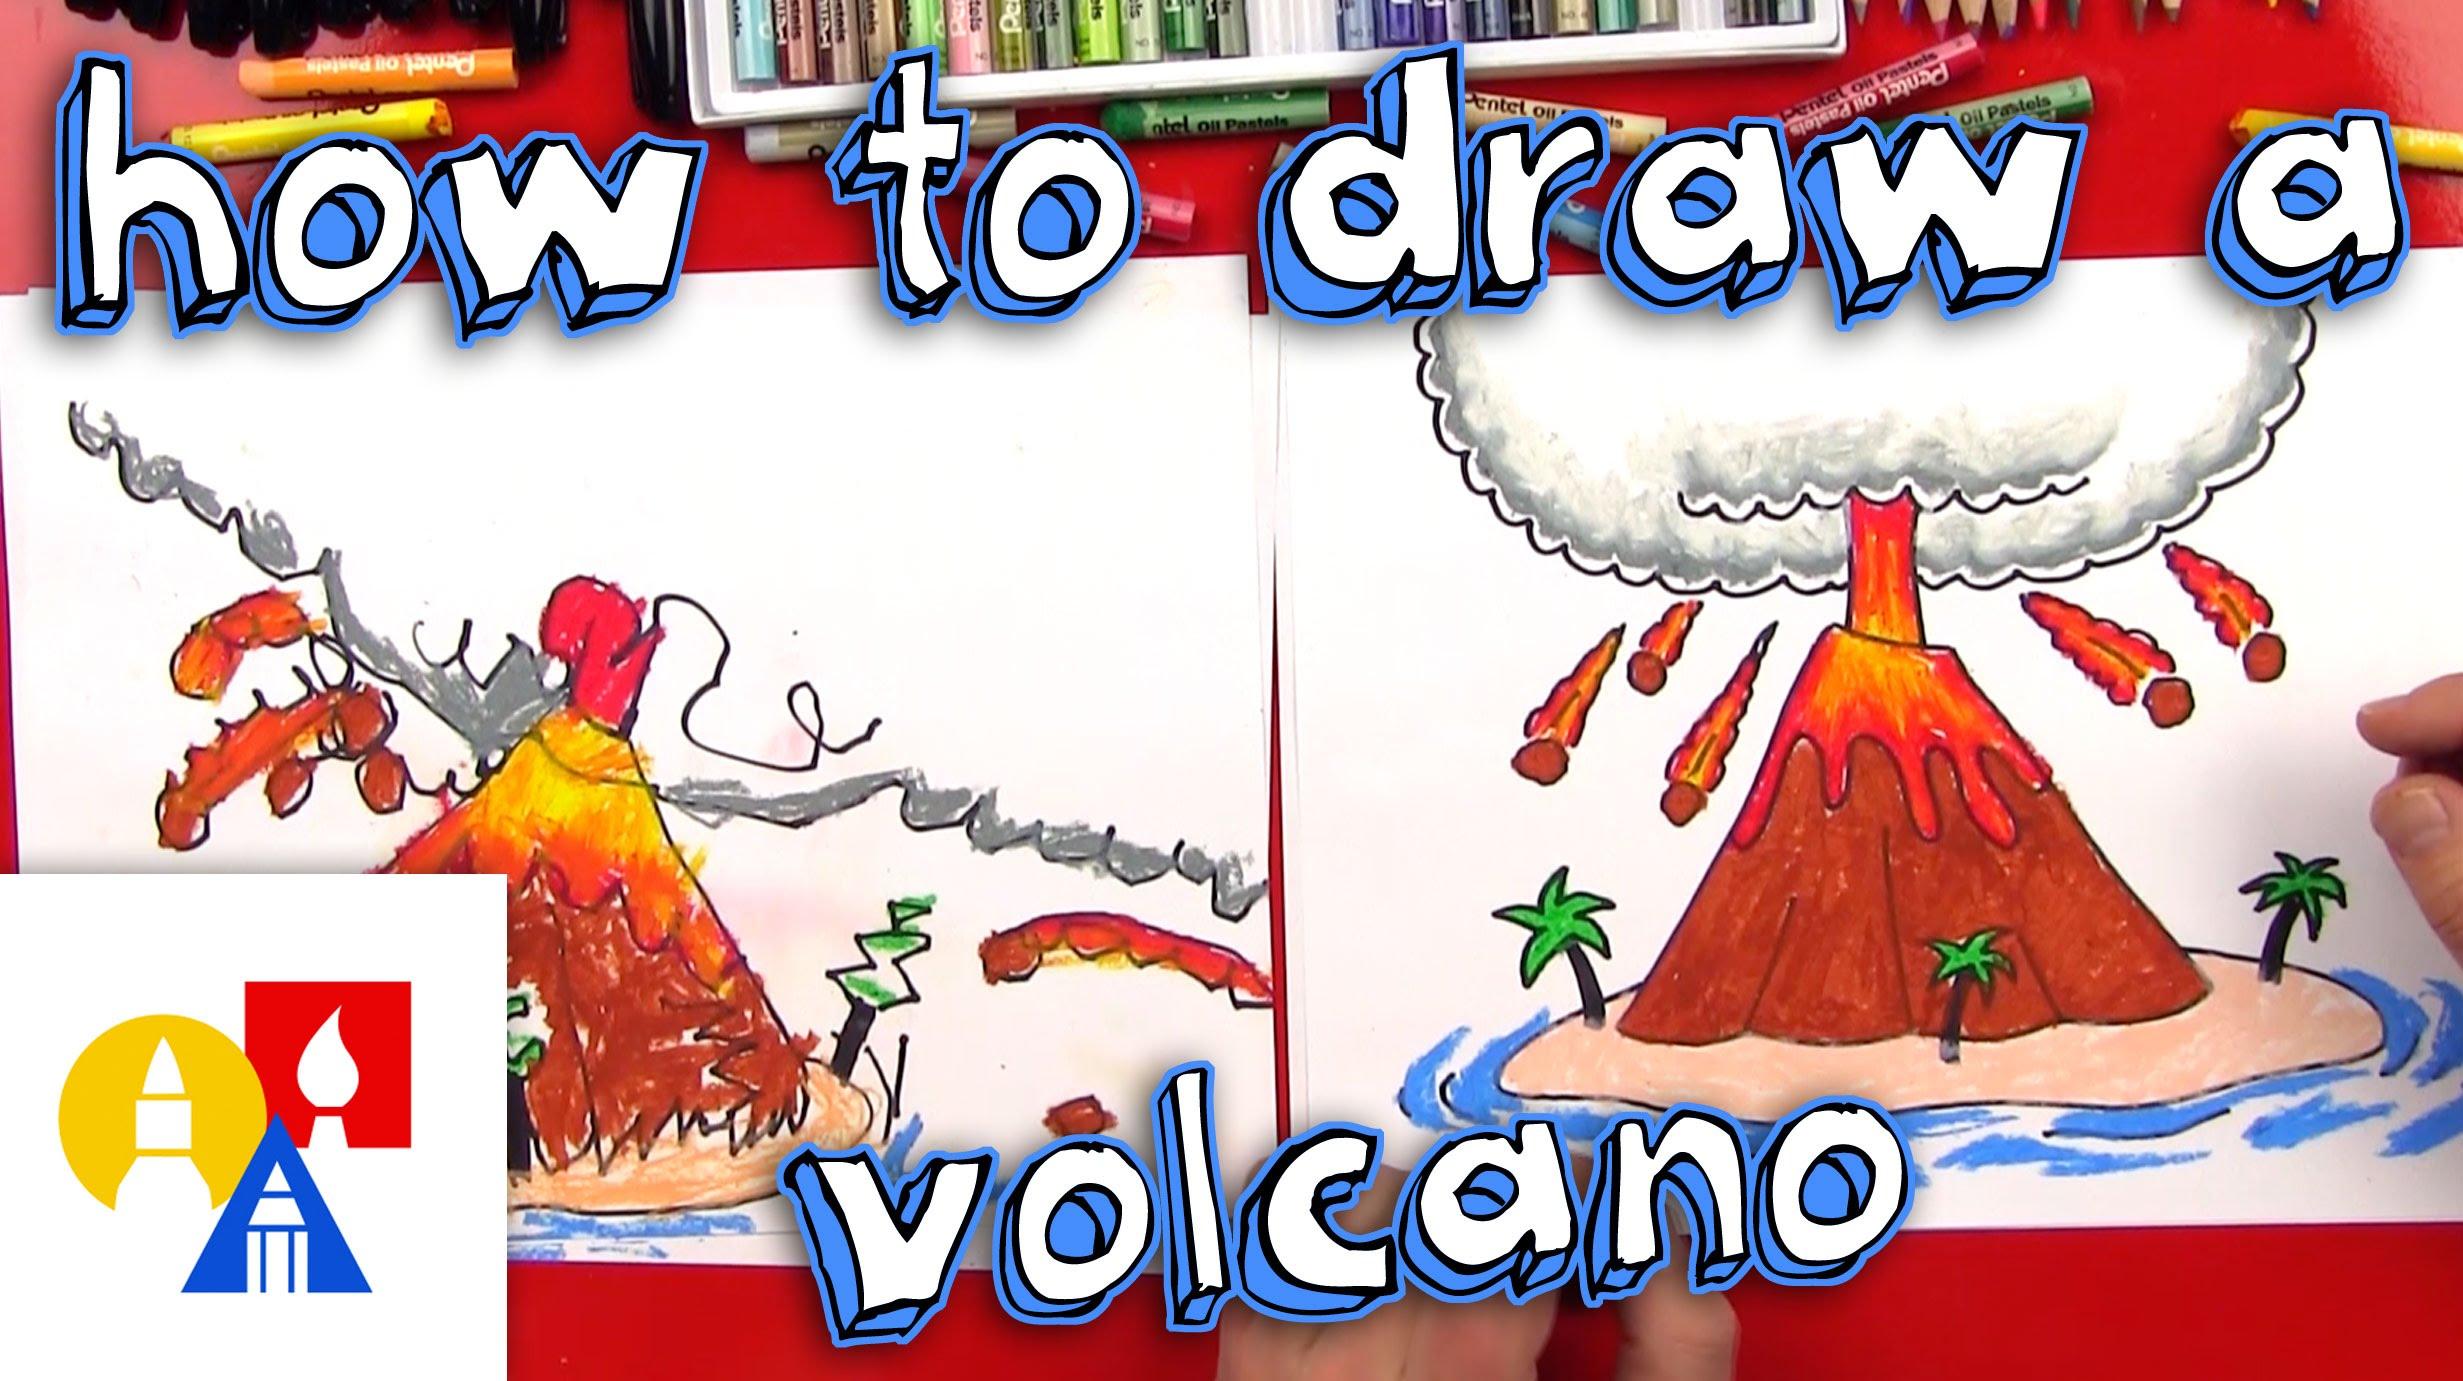 Drawn volcano volcano eruption How Volcano YouTube A Draw